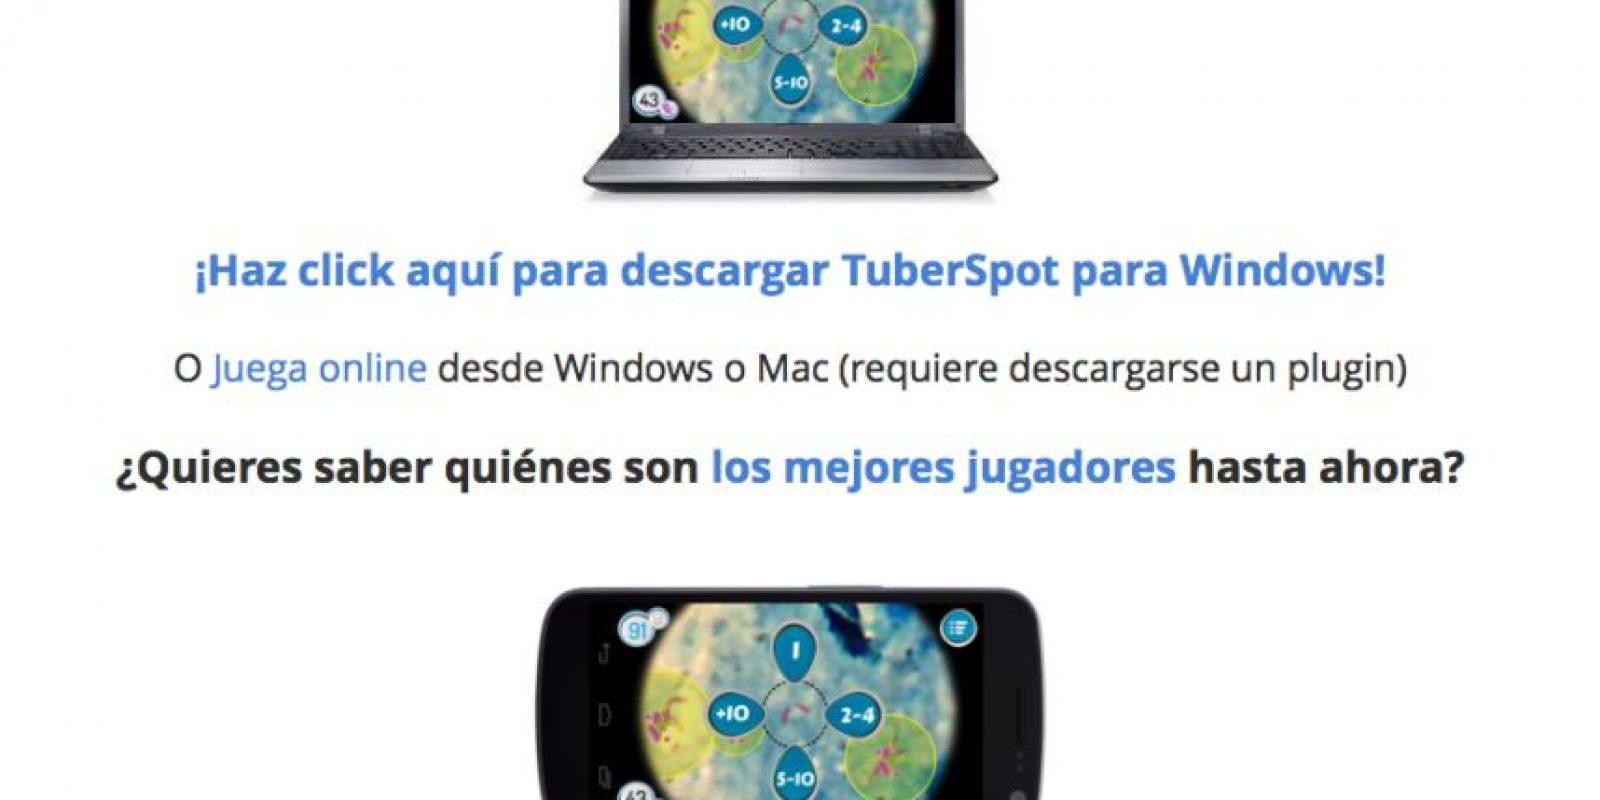 Pueden jugarlo en PC, Mac o smartphone. Foto:tuberspot.org